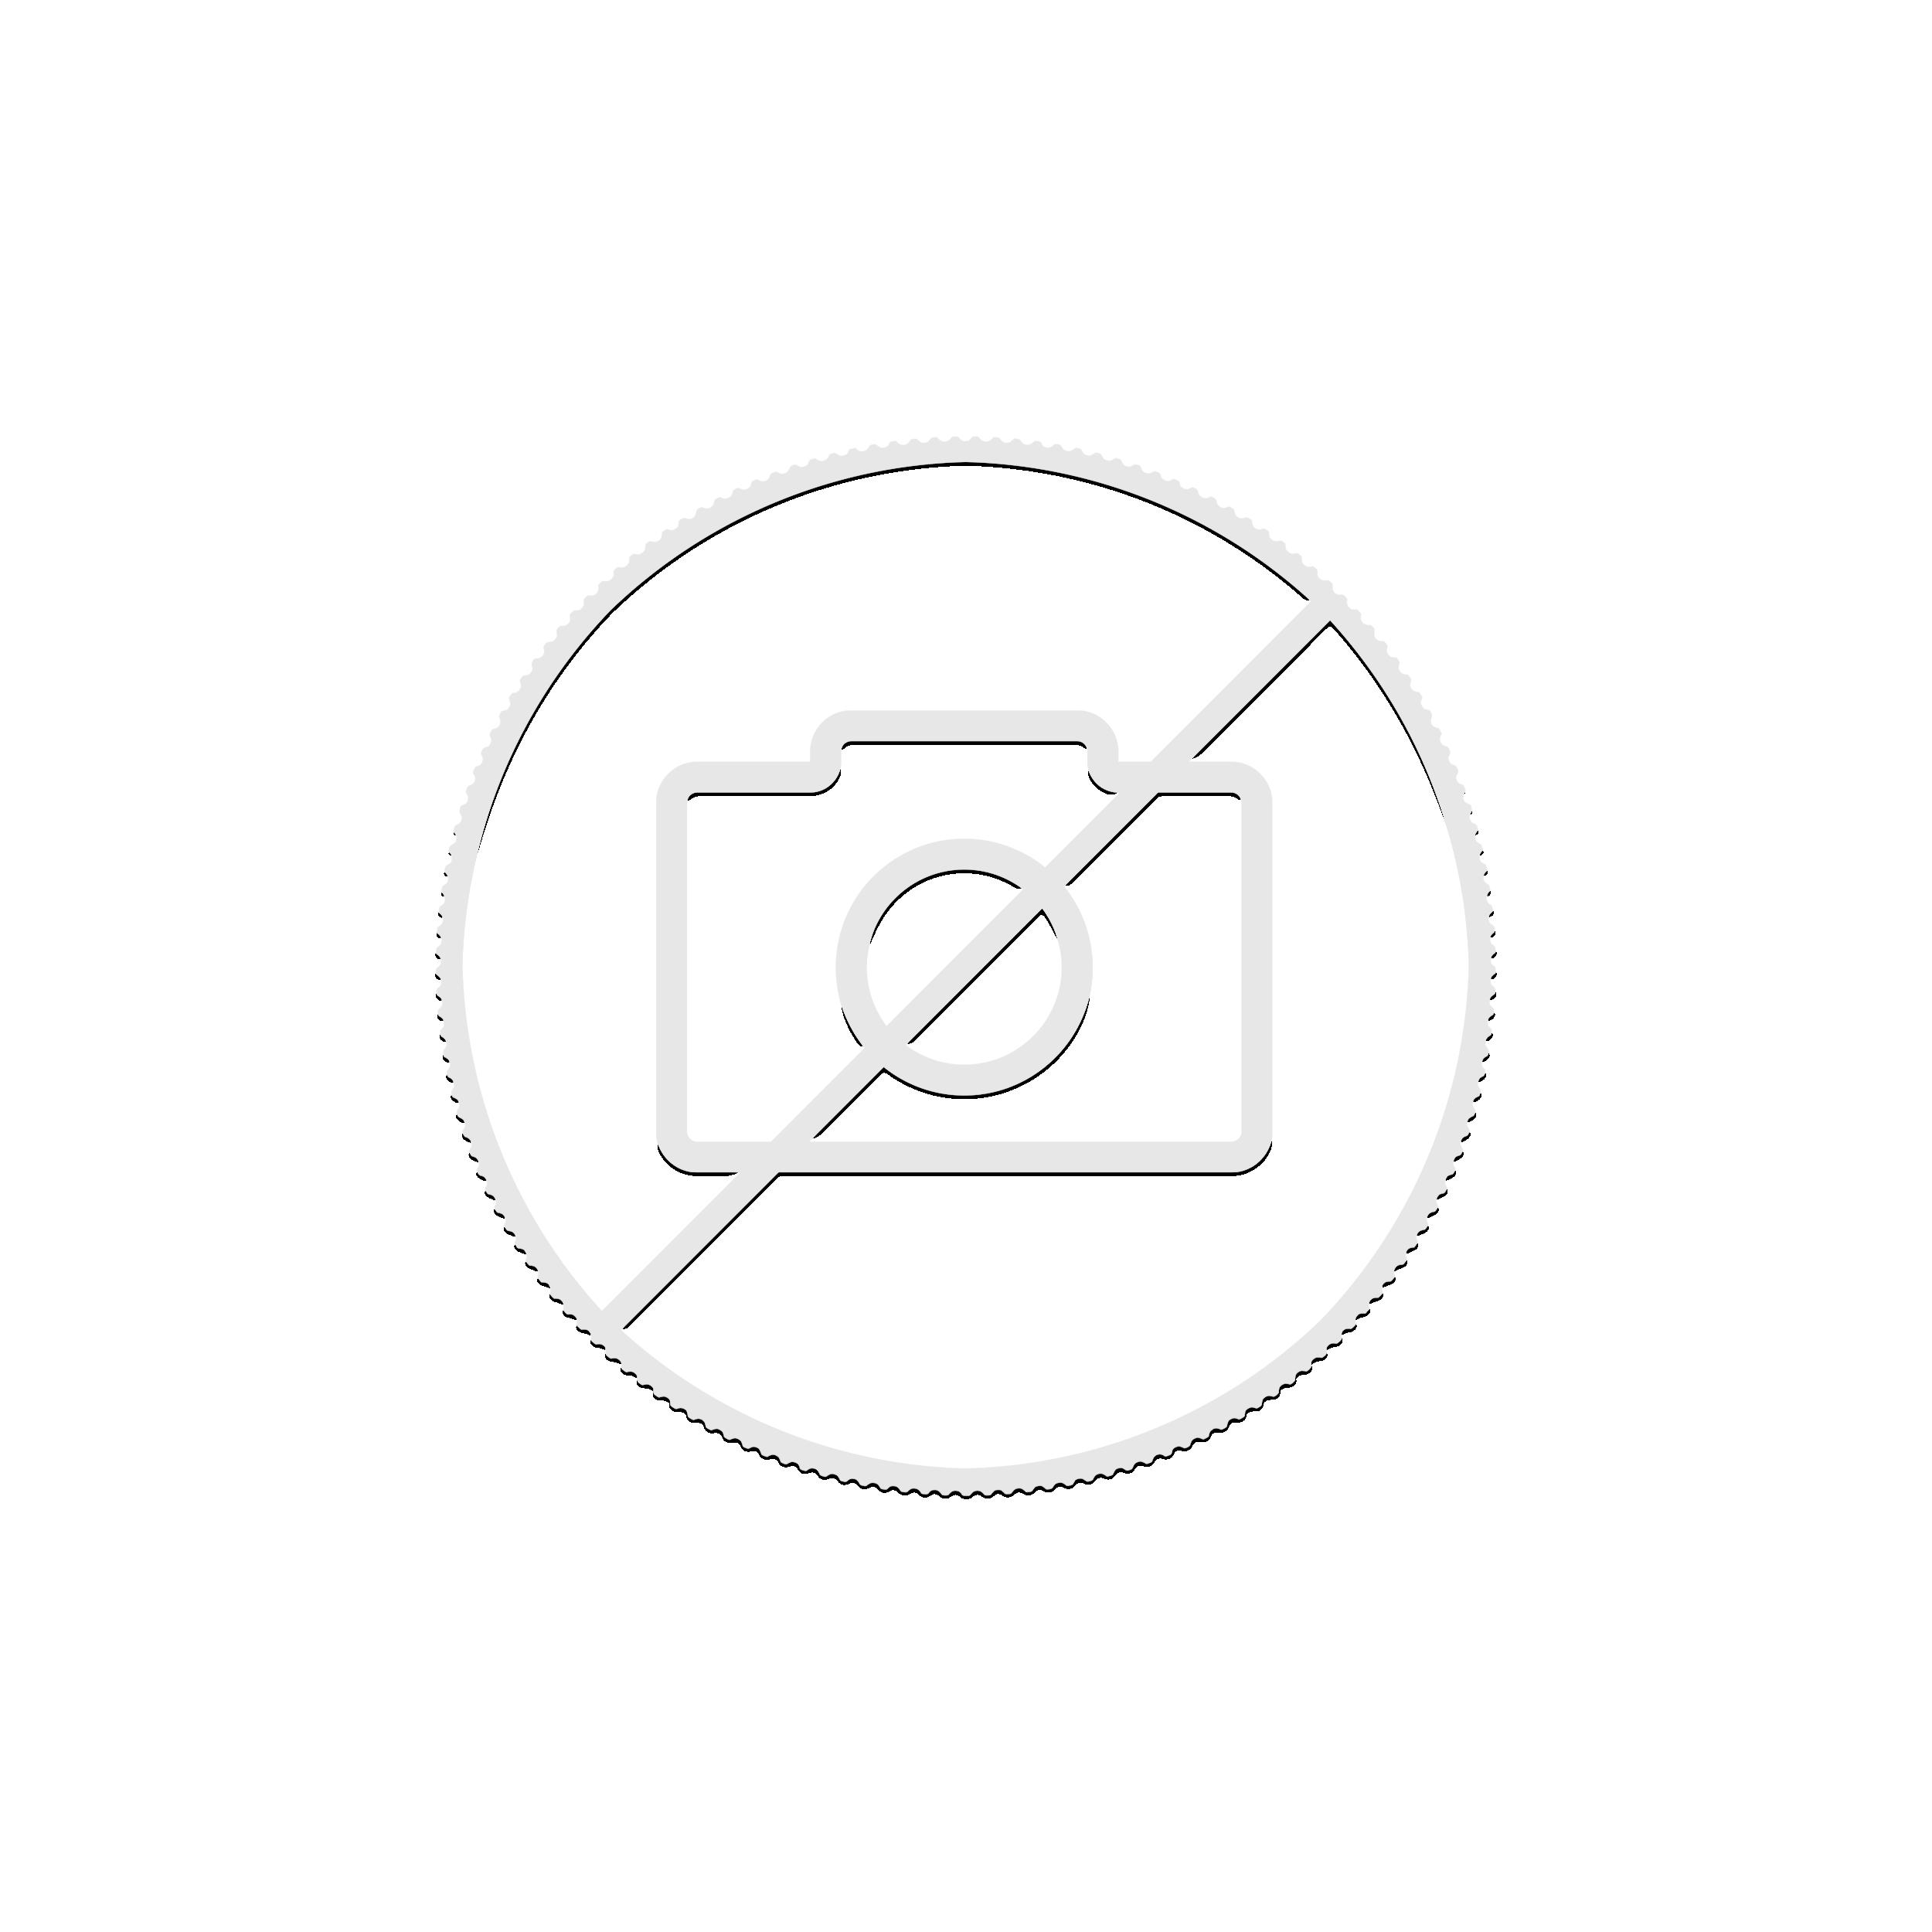 8 Gram gold coin Panda 2021